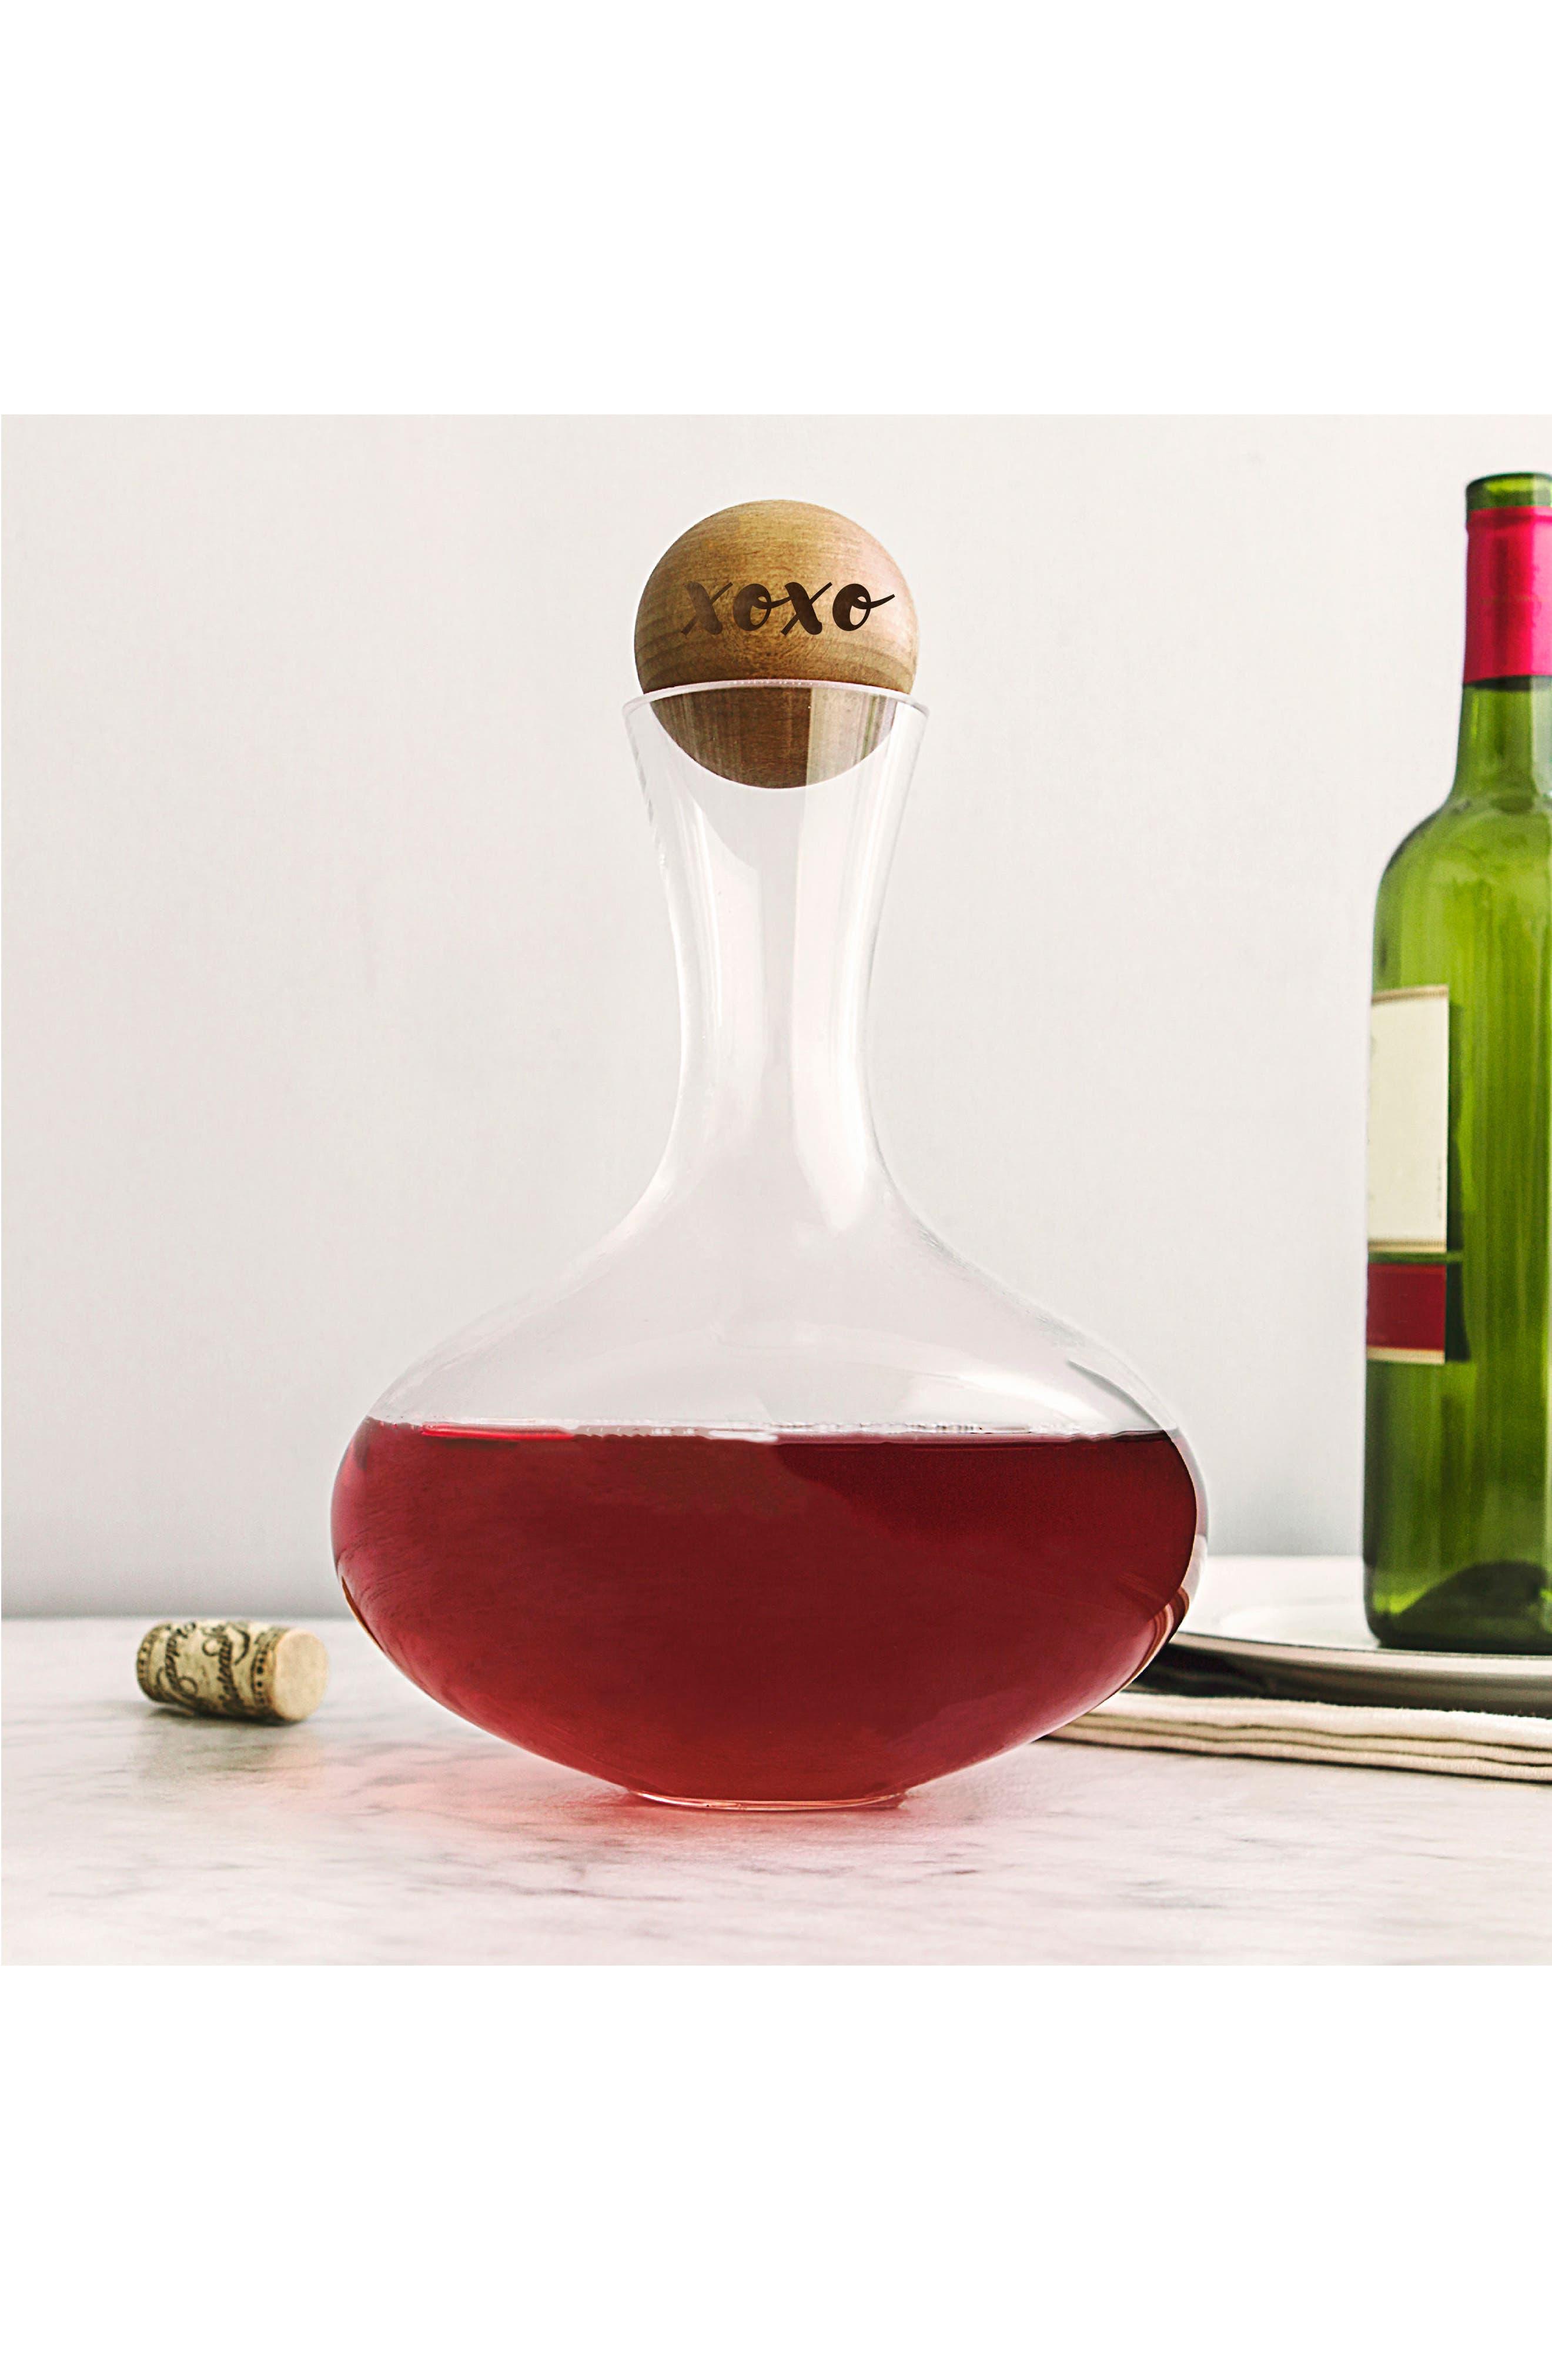 Main Image - Cathy's Concept XOXO Wine Decanter